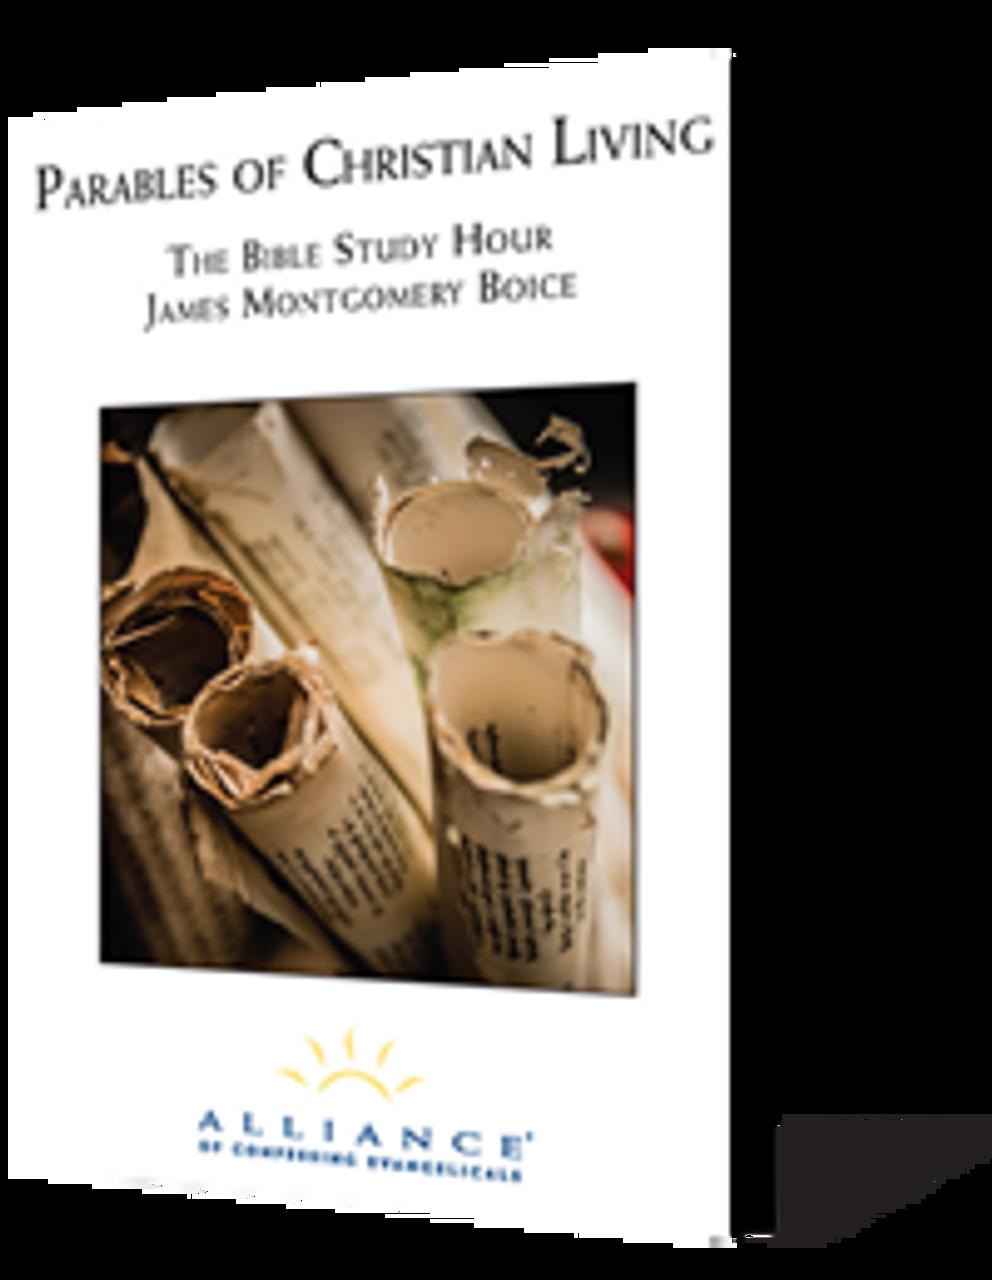 Parables of Christian Living (CD Set)